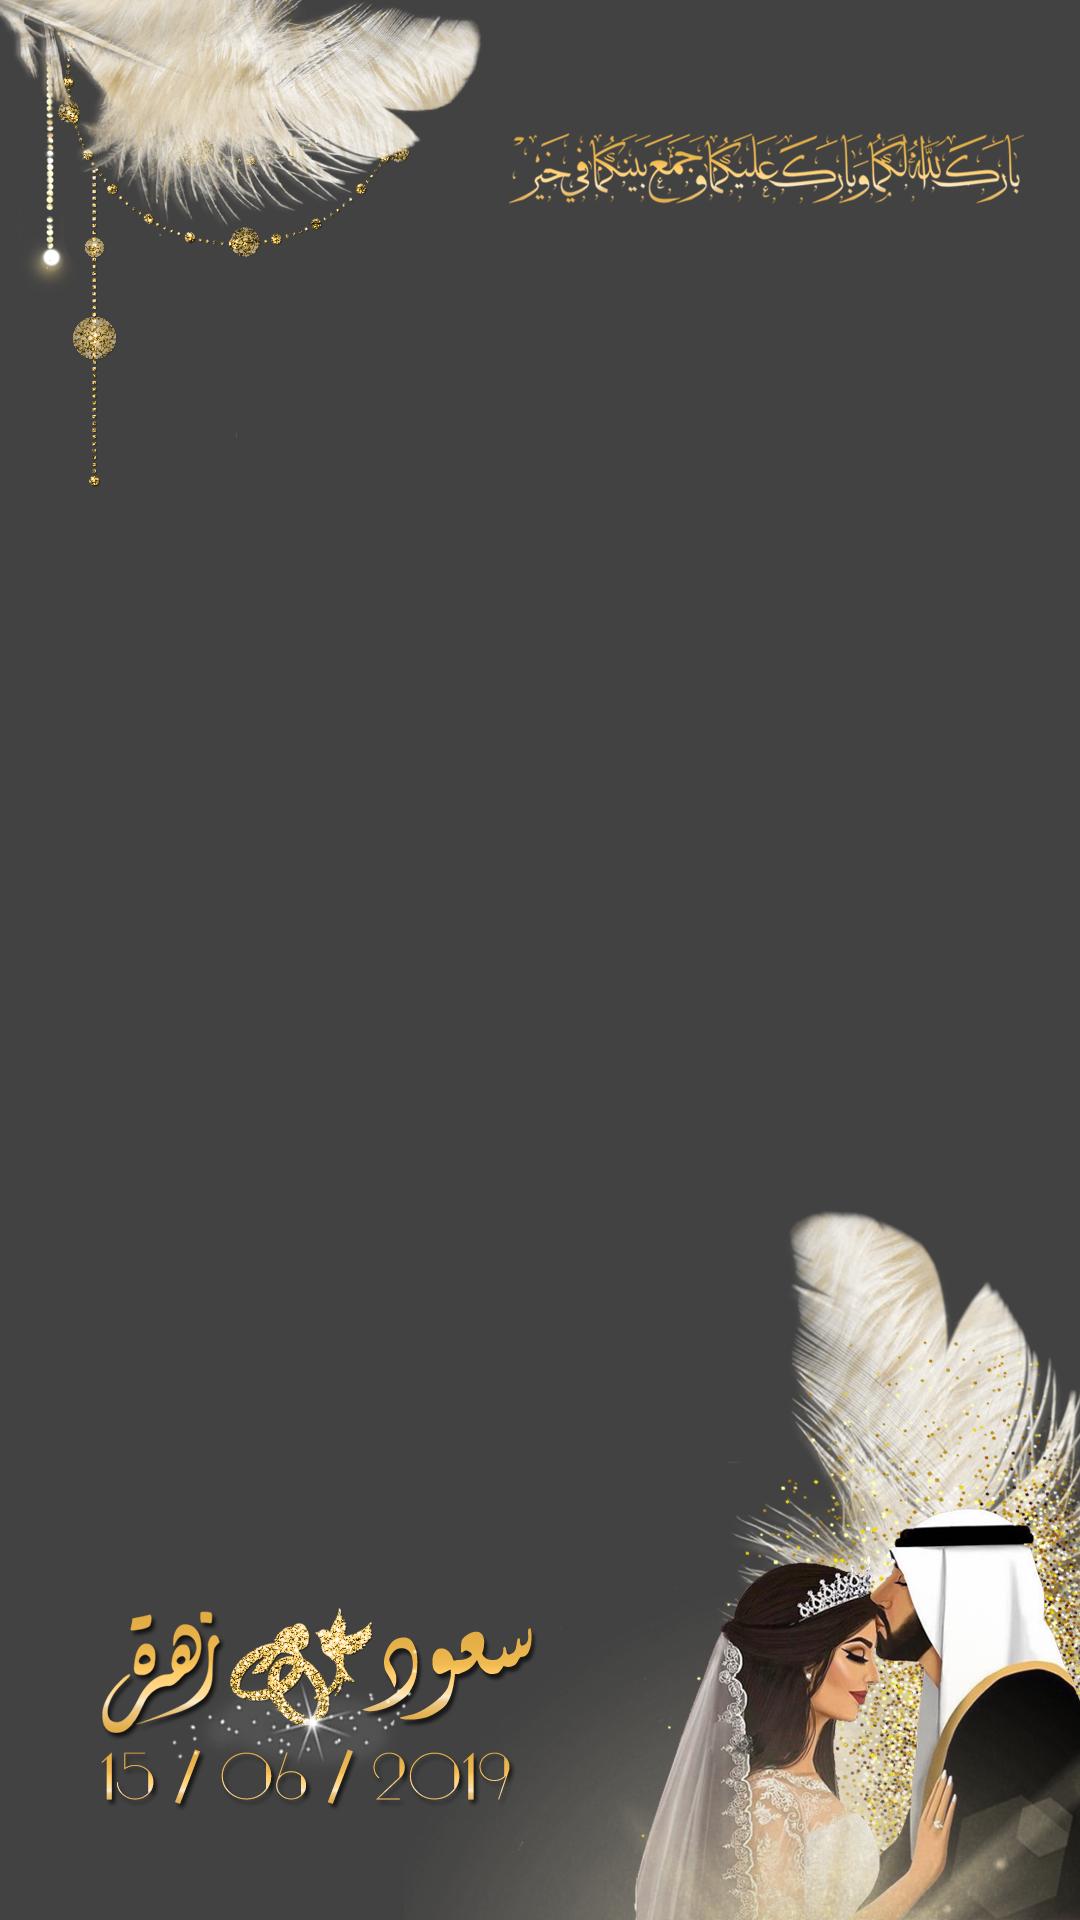 فلتر زواج Wedding Logo Design Wedding Filters Photography Inspiration Portrait